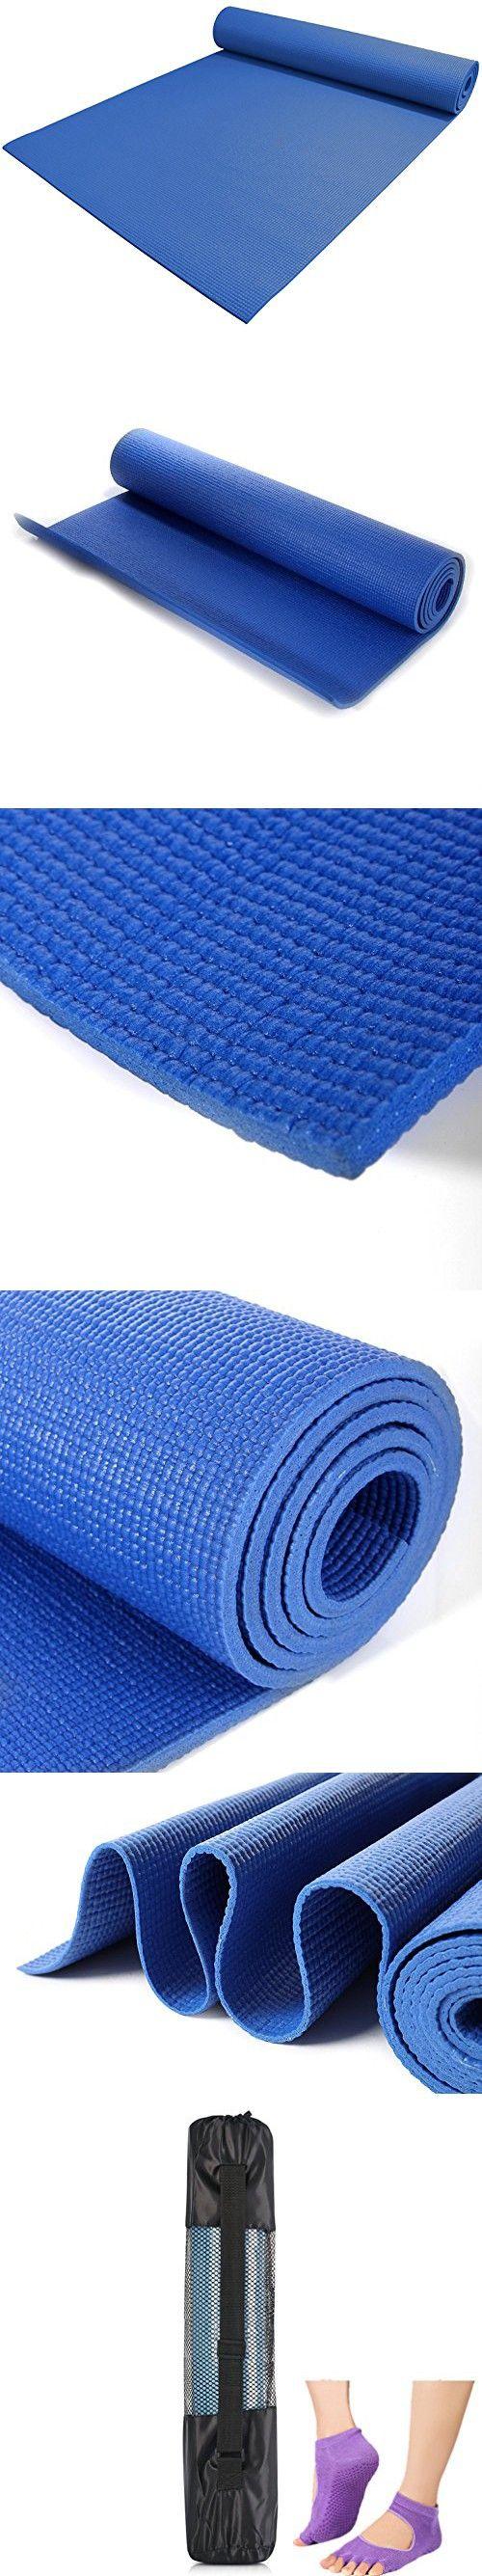 Love-Yoga Exercise Yoga Mat(Pilates Mat) ,Eco Friendly, Biodegradable, Anti Slip, Anti Bacterial, Non Toxic, Non Smelly (Blue, 1/4 Inch)